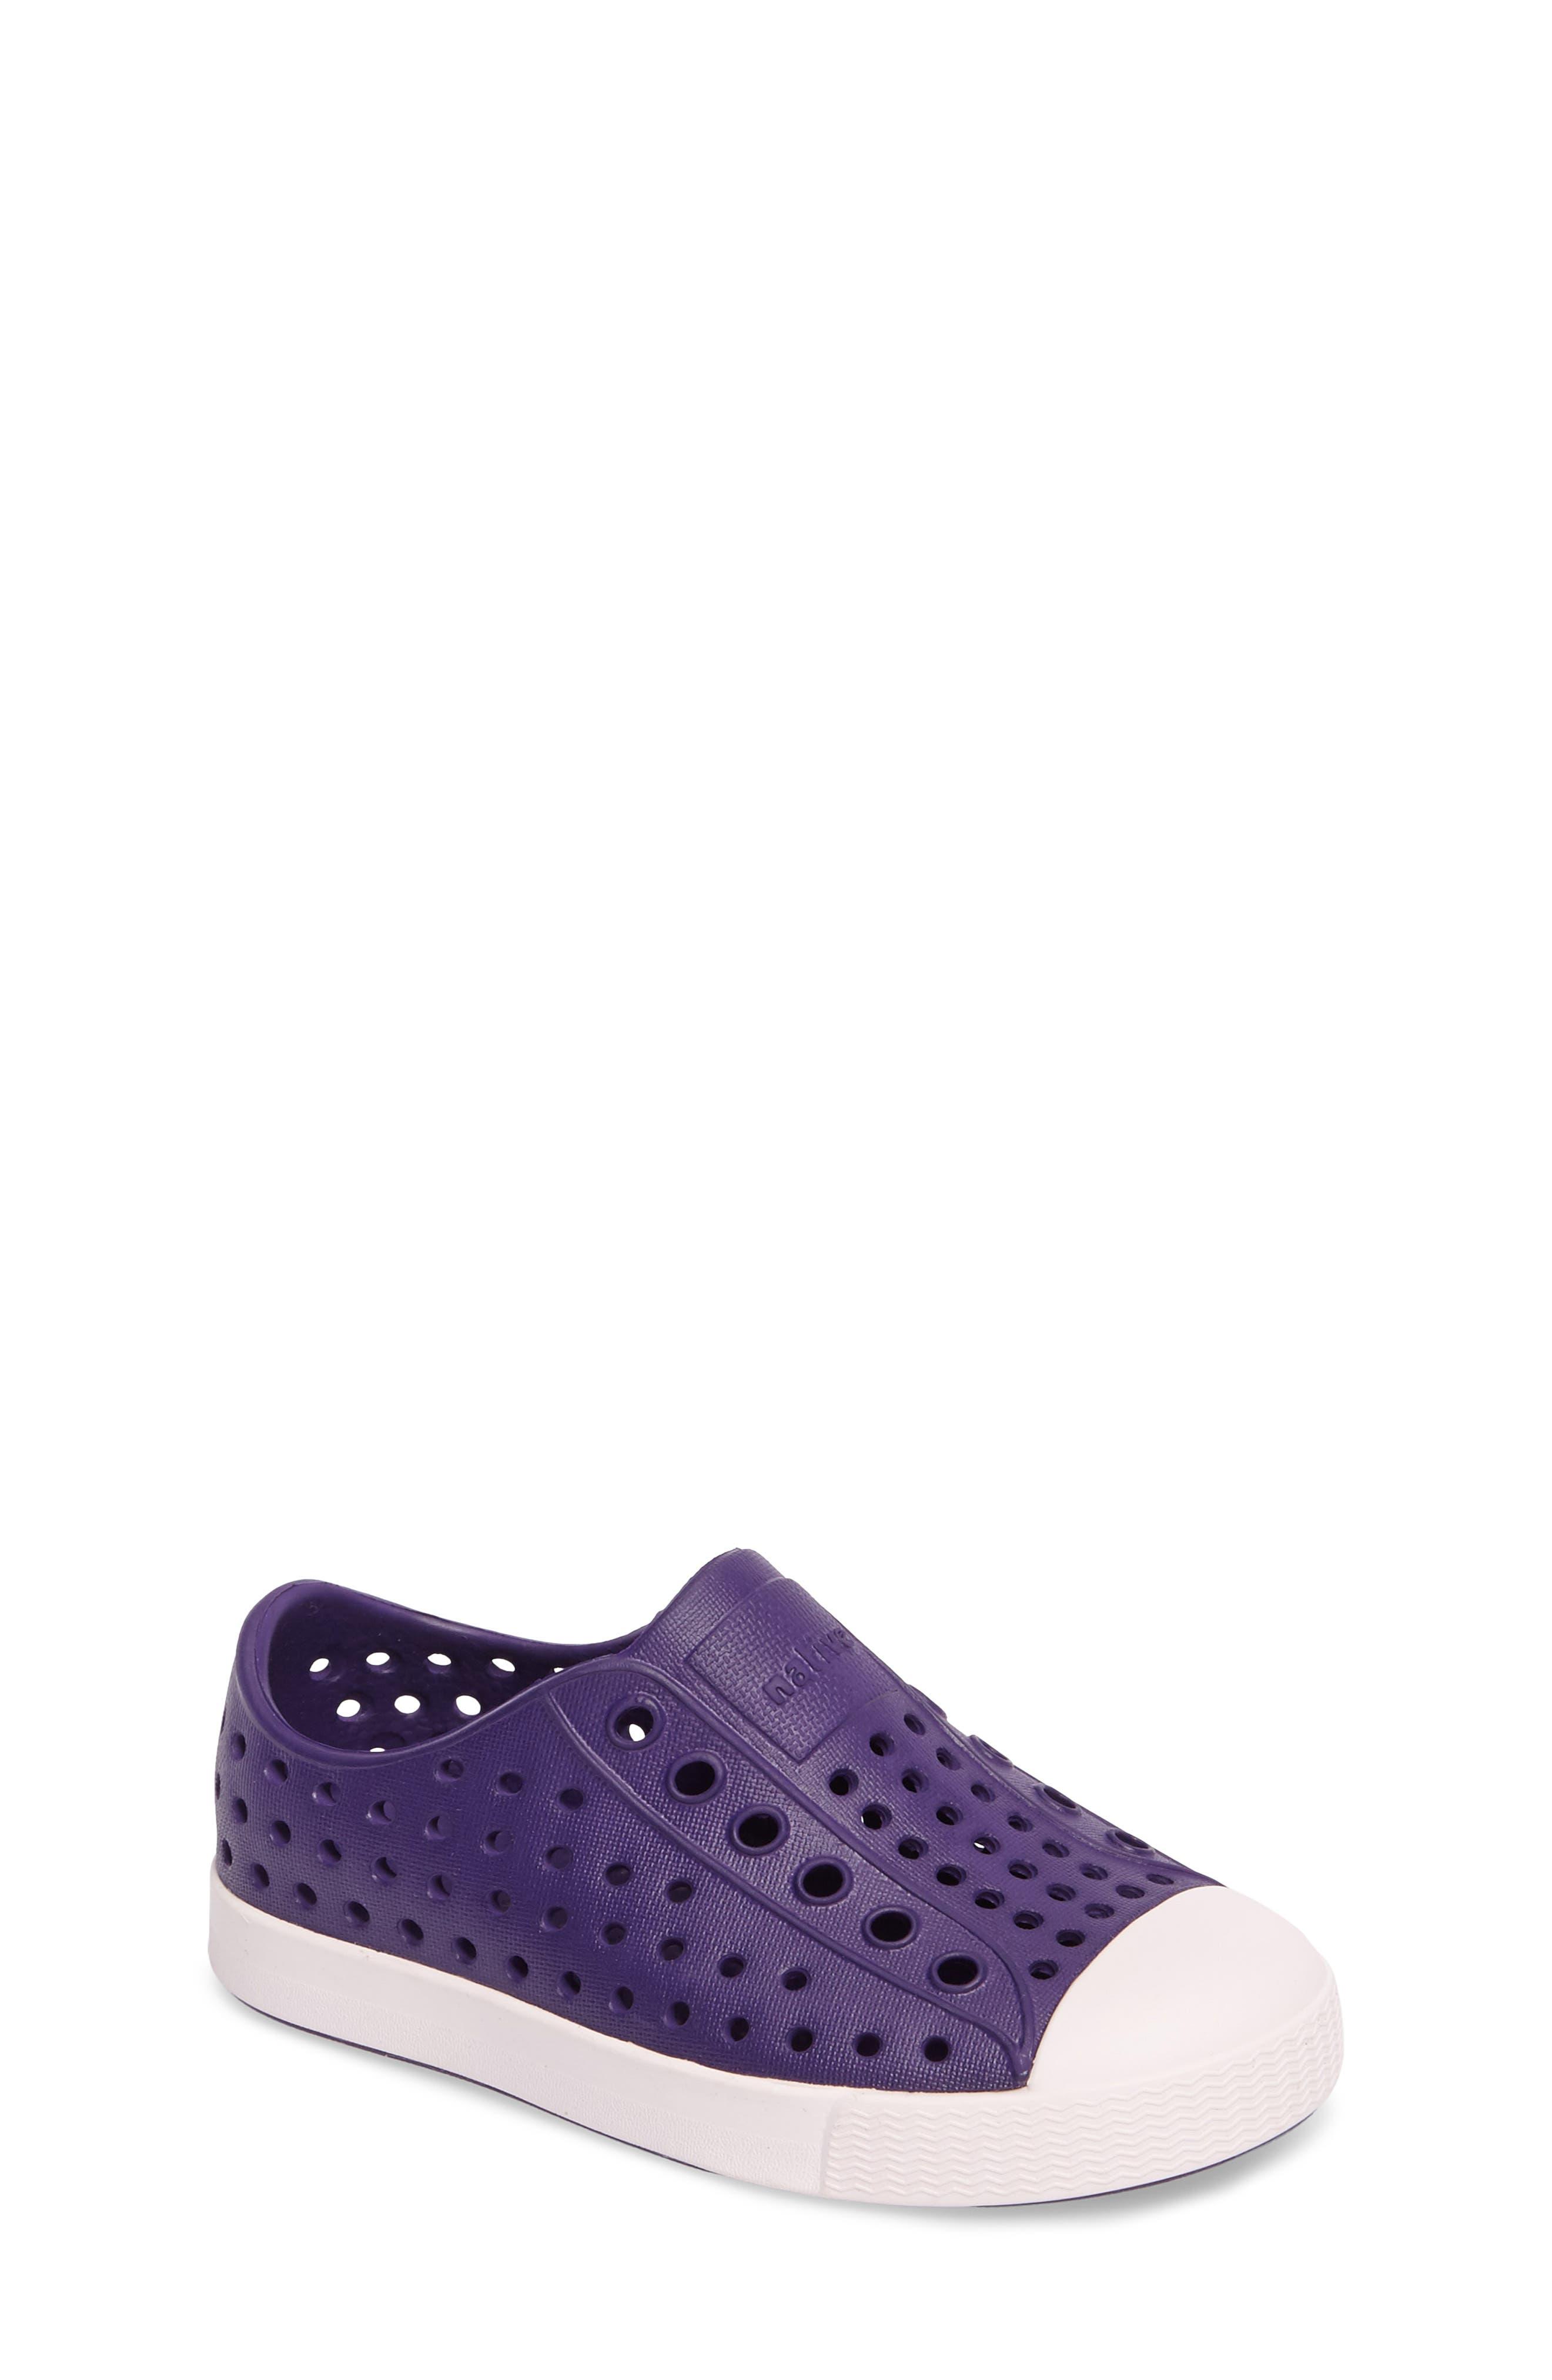 'Jefferson' Water Friendly Slip-On Sneaker,                             Main thumbnail 52, color,